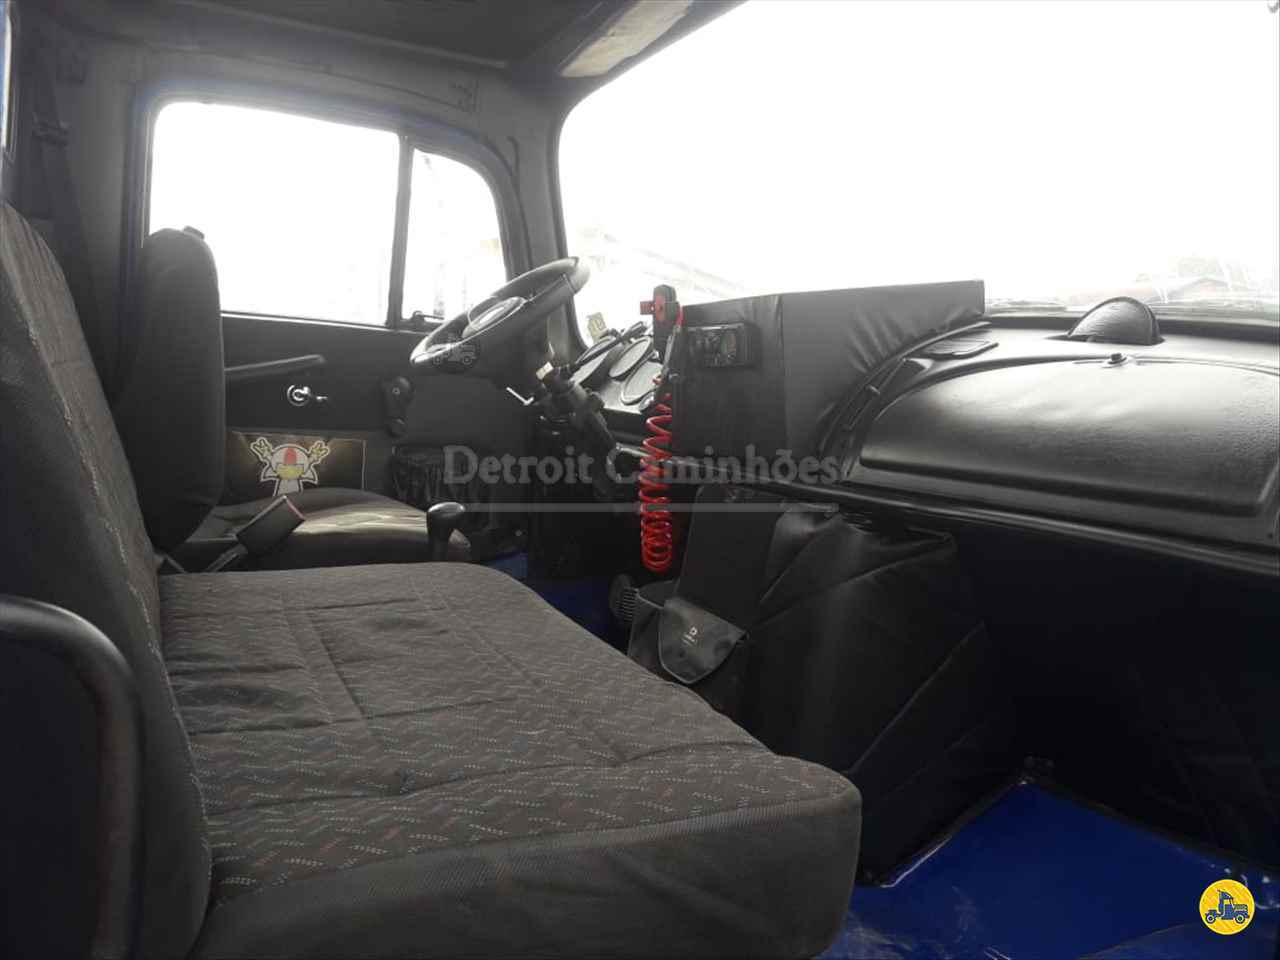 MERCEDES-BENZ MB 1113 300000km 1972/1972 Detroit Caminhões